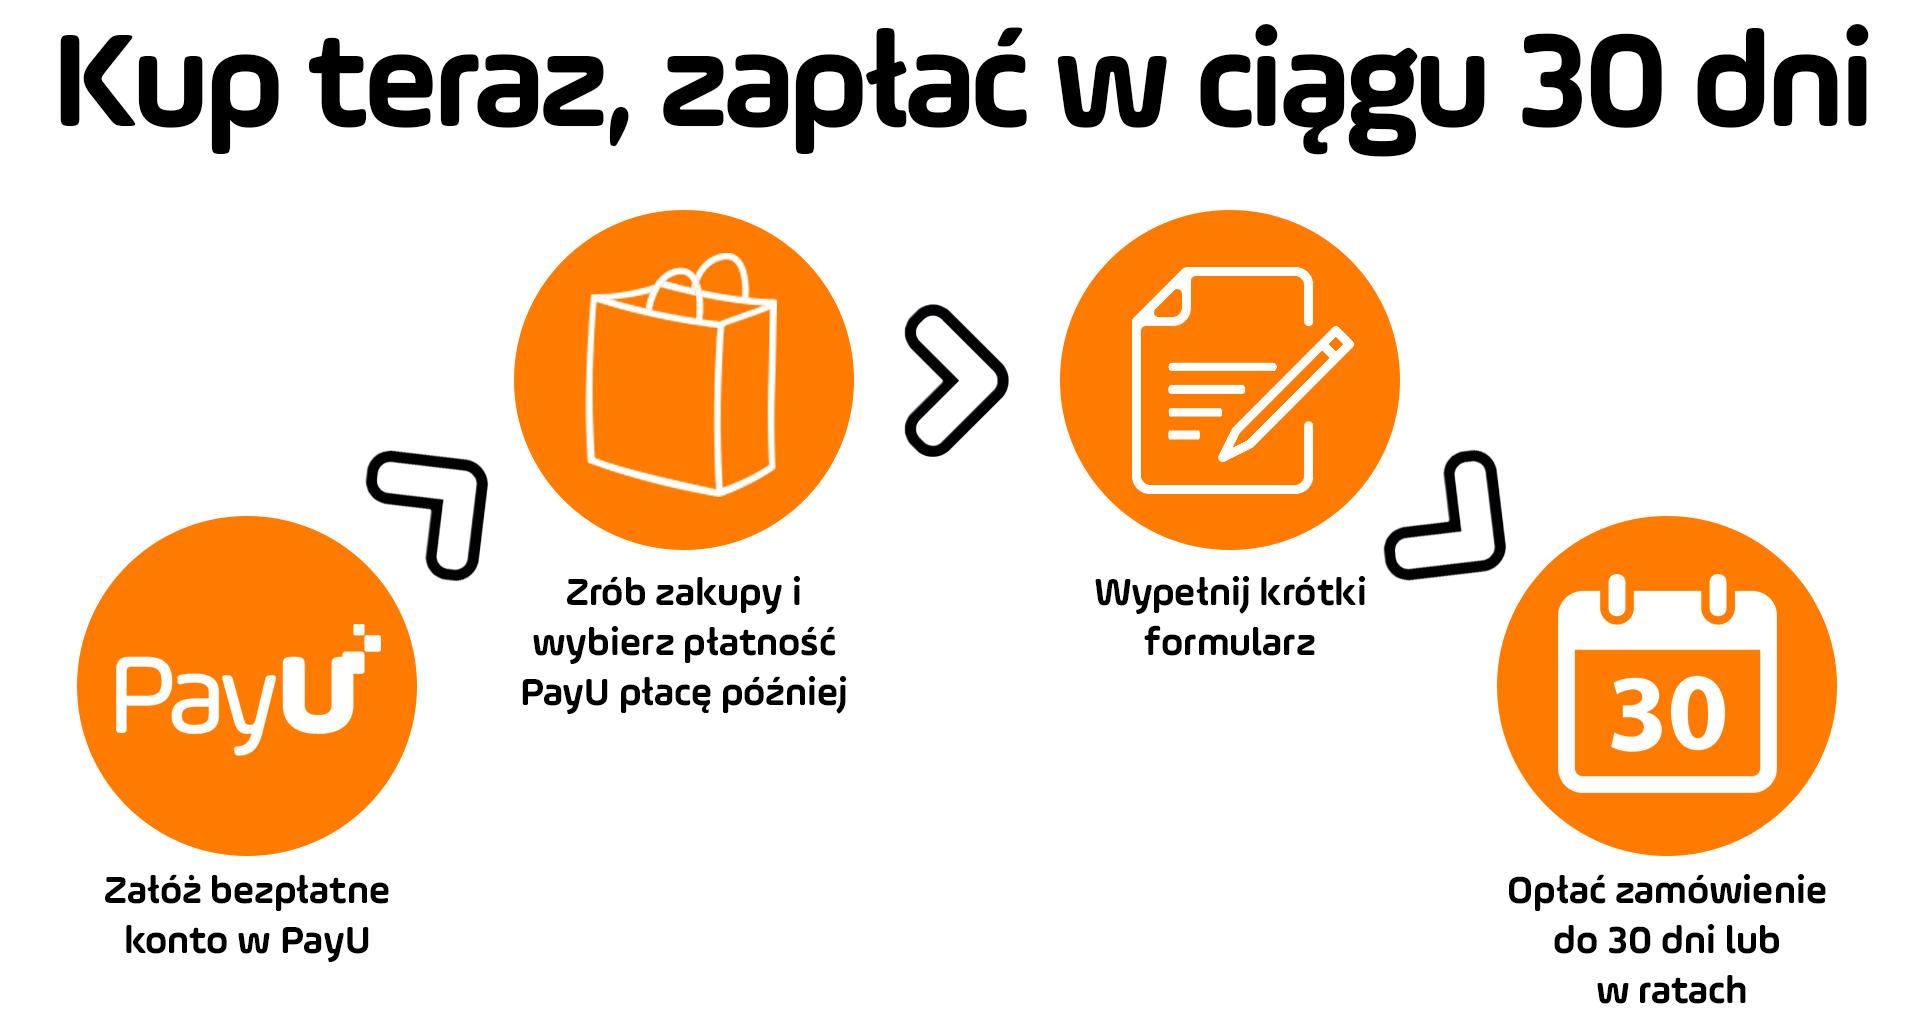 http://jbpartner.pl/zdjecia/payu%20op%C3%B3%C5%BAniona%20p%C5%82atno%C5%9B%C4%87%20schemat.jpg